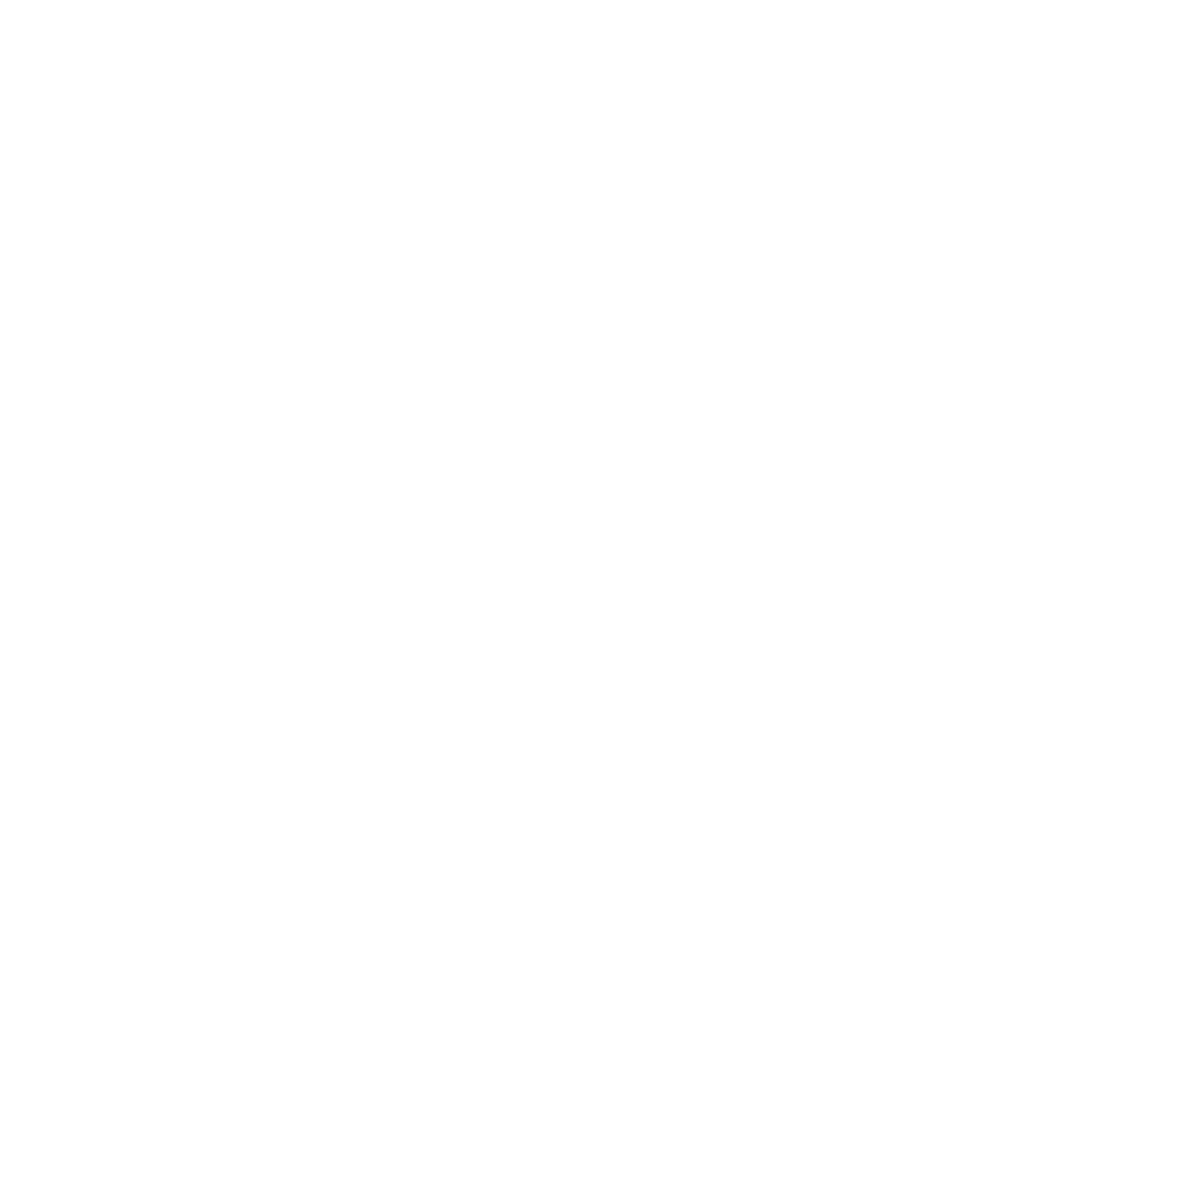 longtin_w